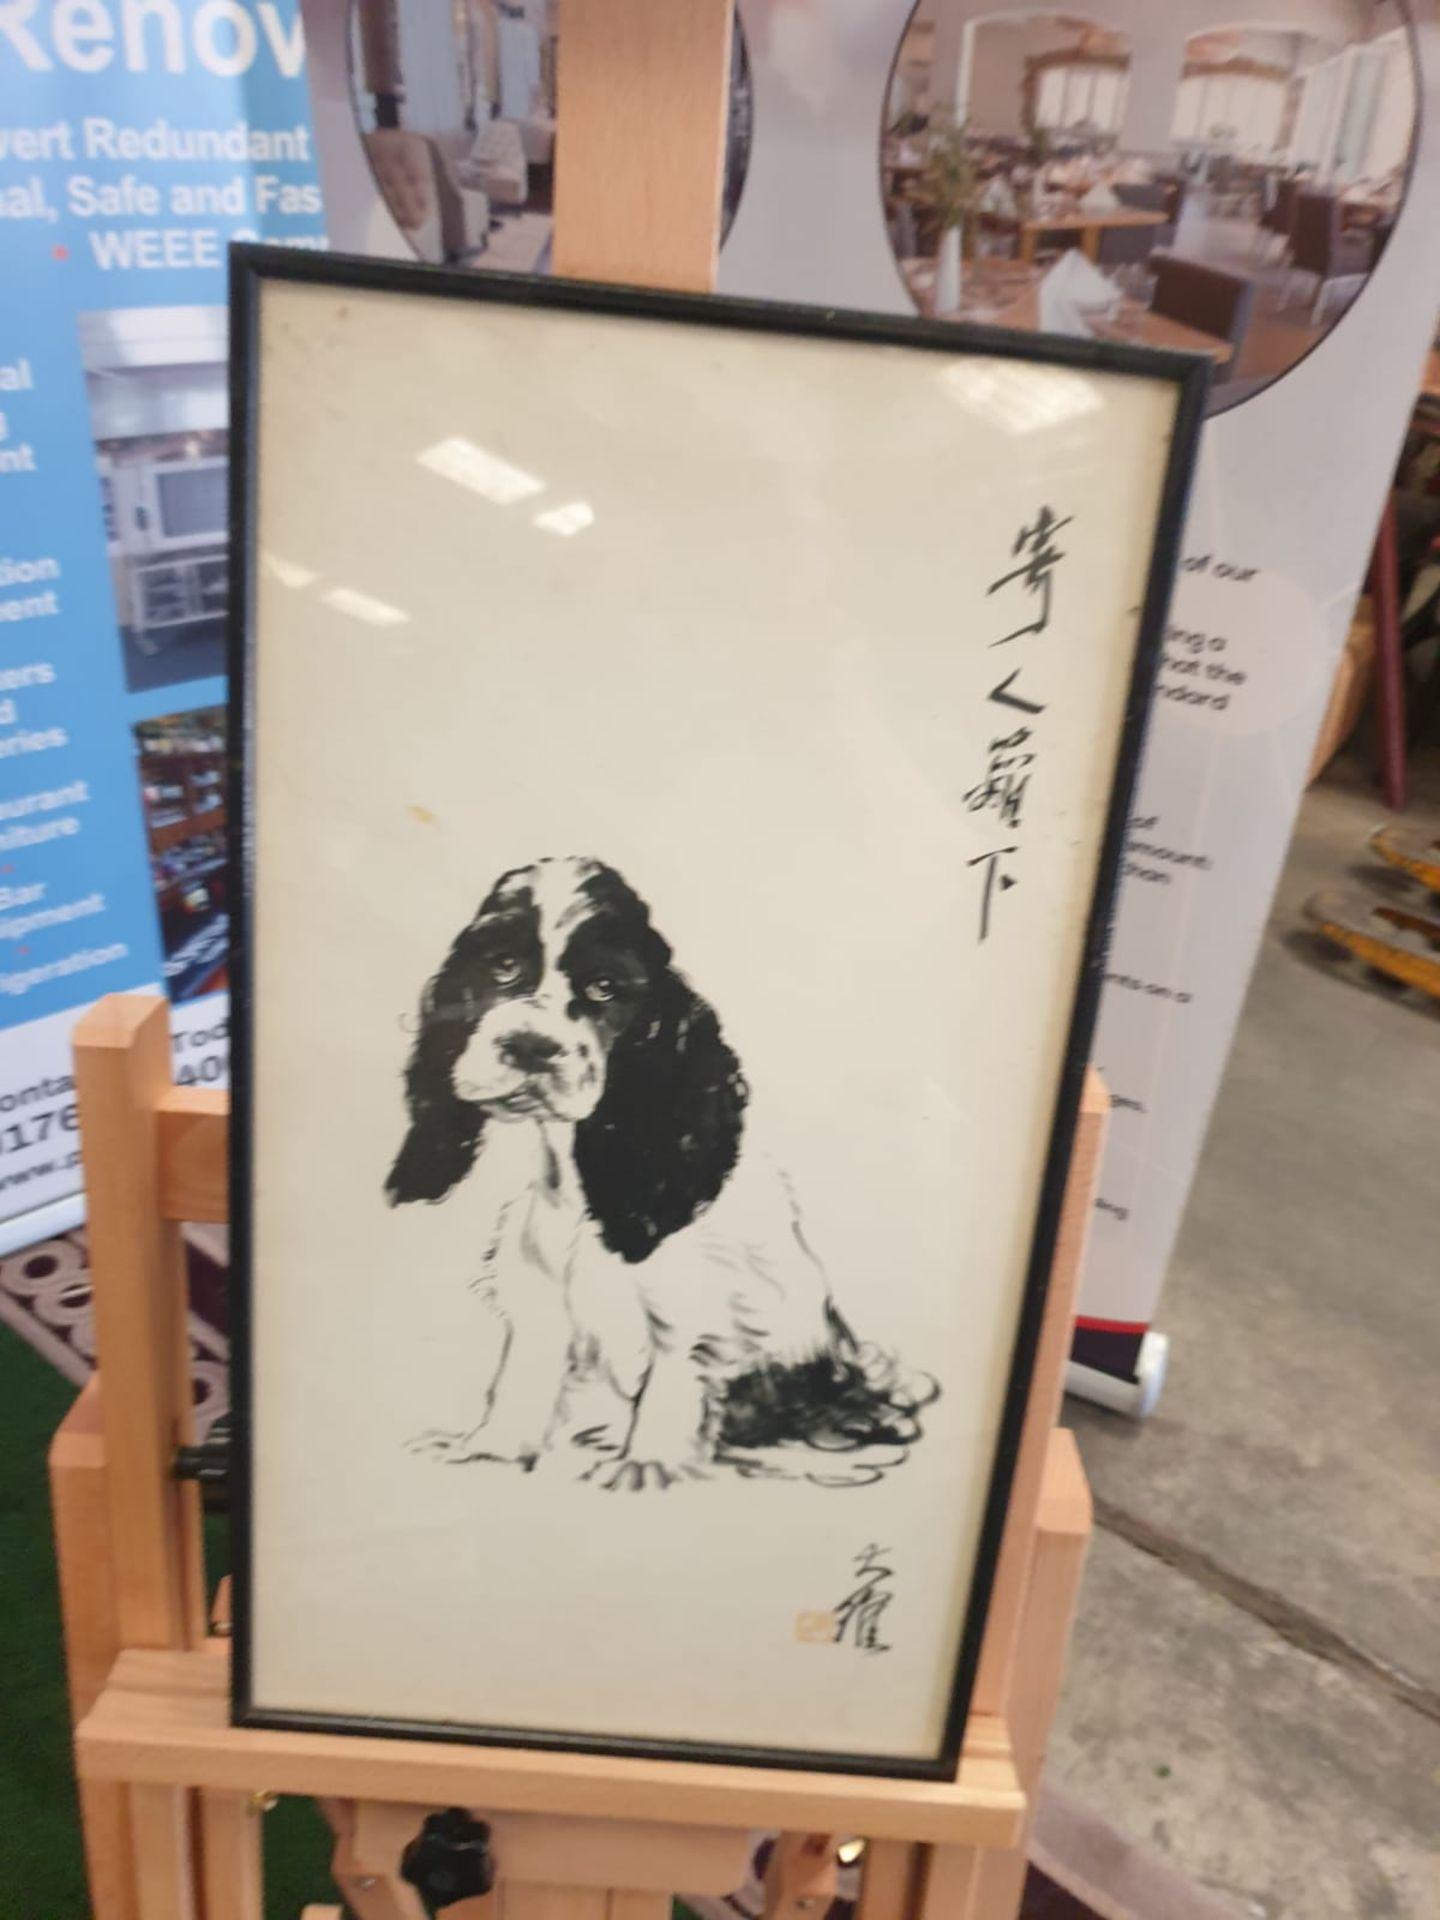 David Kwo Da-Wei (1919-2003) Chinese Lithographic Print Spaniel Da Wei Kwo, David Kwo 1919-2003 ( - Image 4 of 4